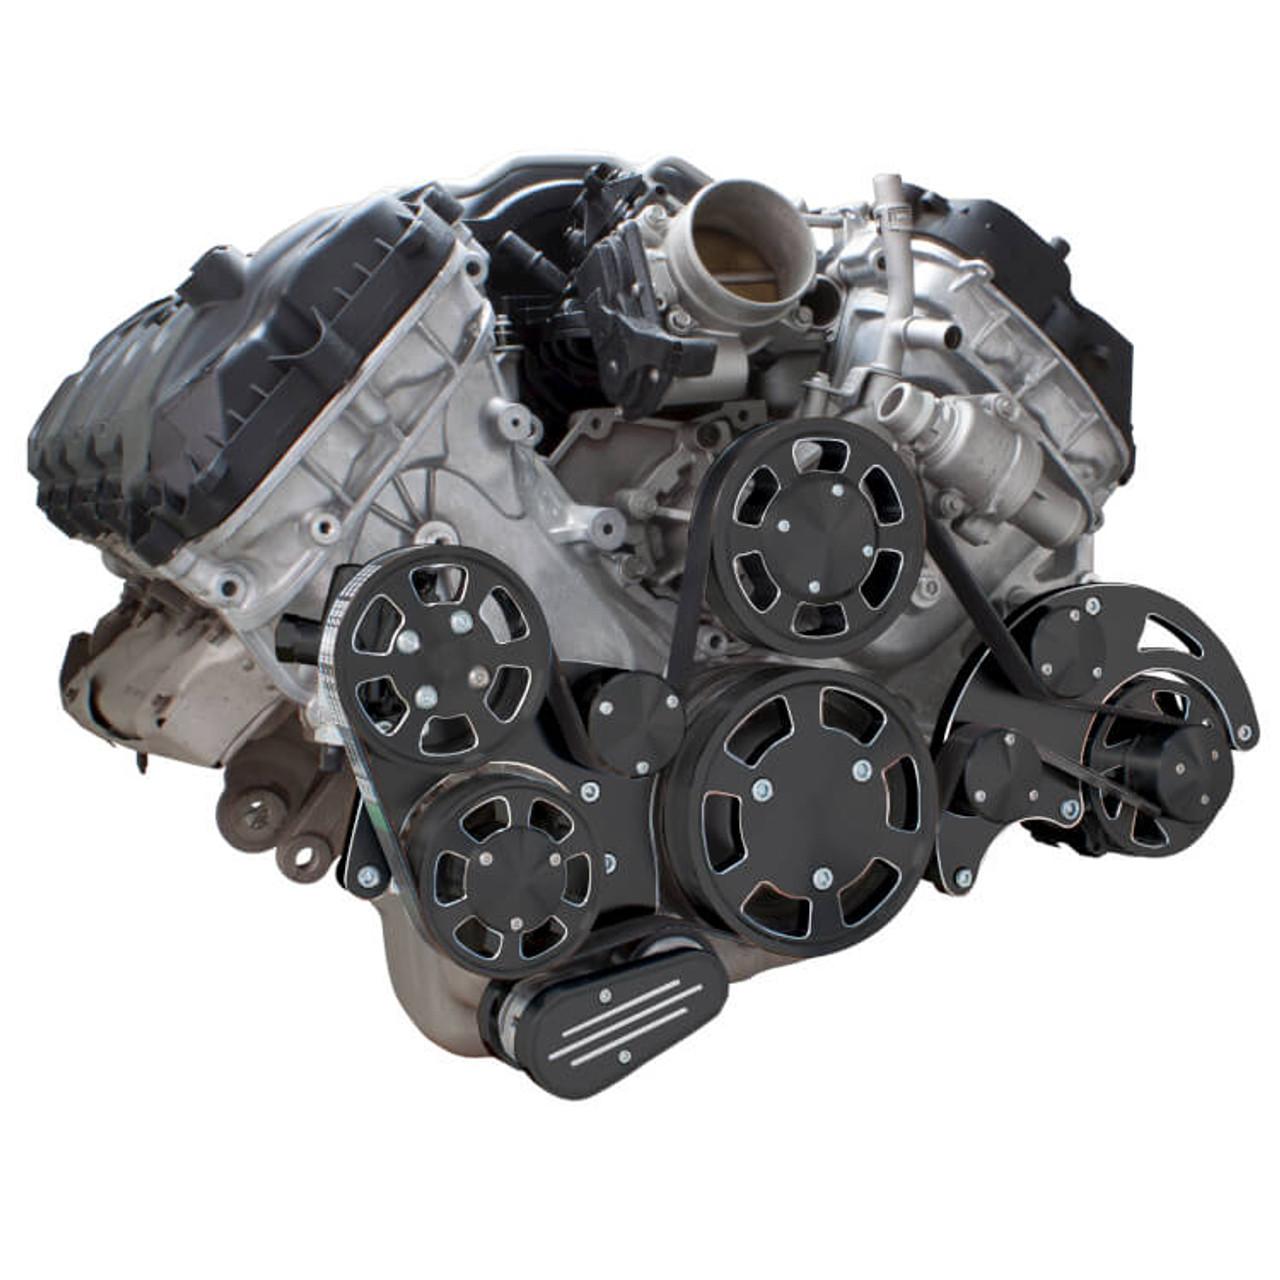 black diamond serpentine system for ford coyote 5 0 alternator \u0026 power steering all inclusive 1986 Ford Alternator Wiring